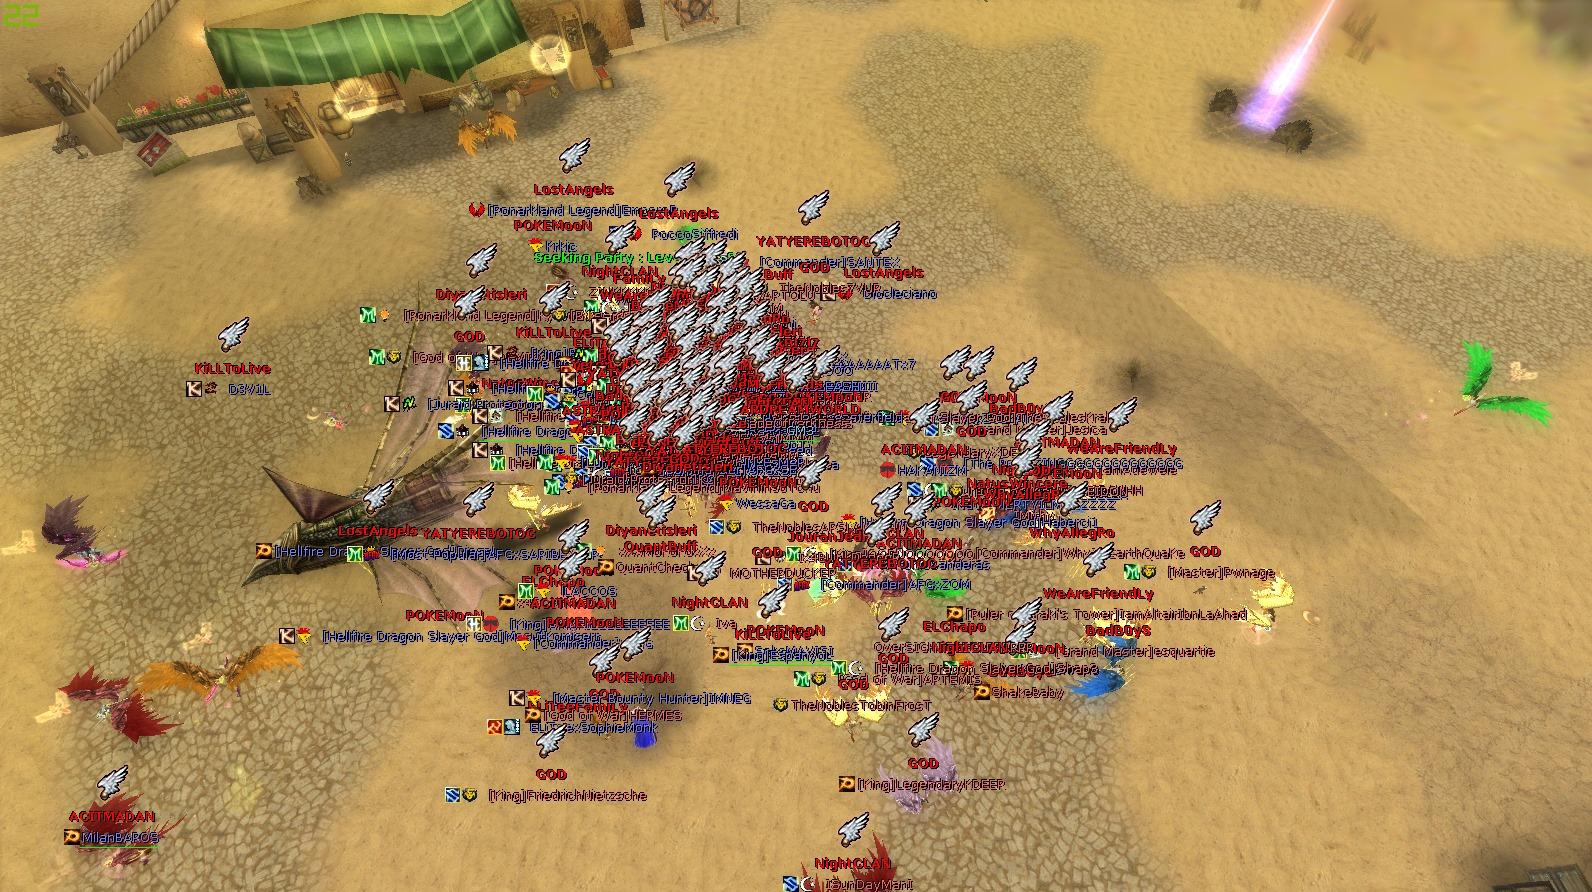 3 Eylül Pvp Server GmrGame - Gmr Game